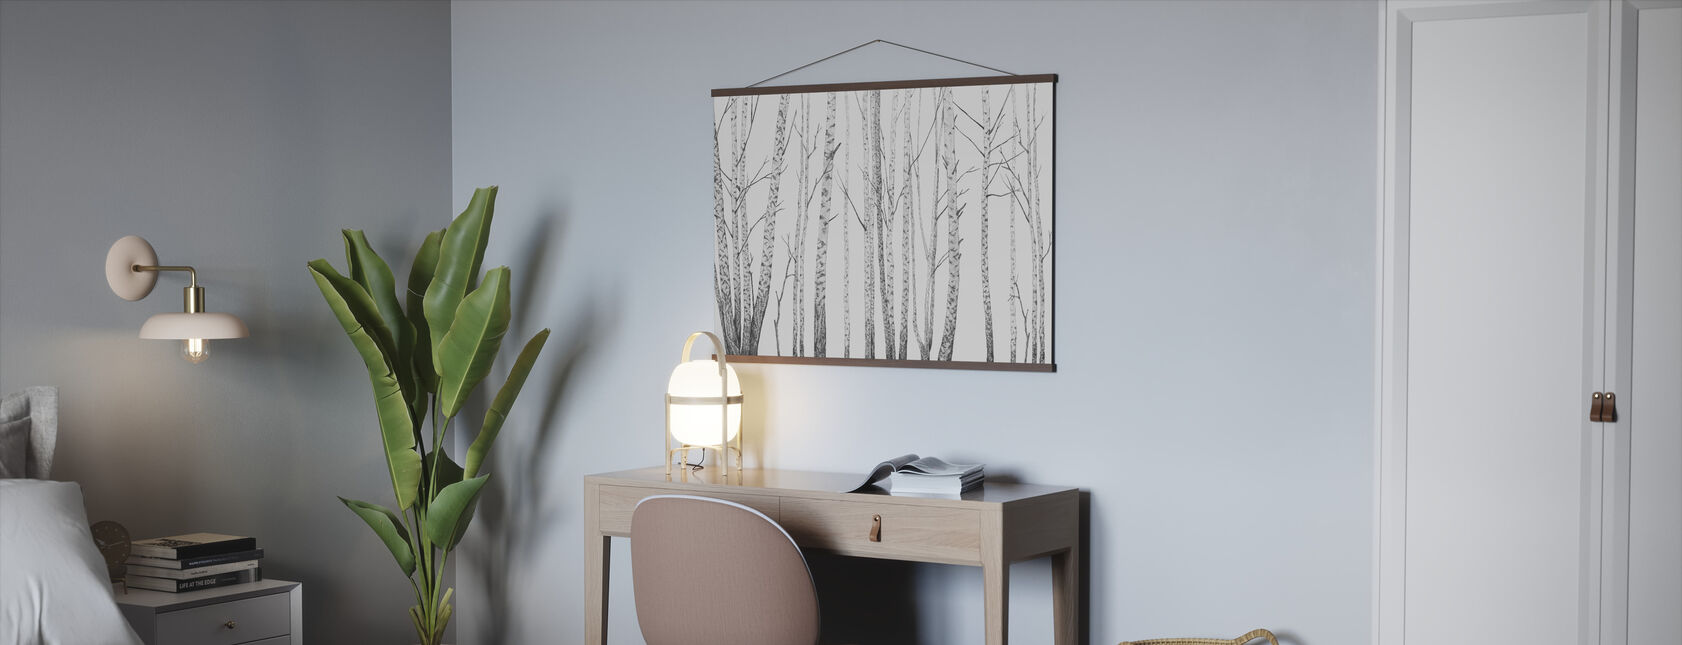 Birch Stems - bw - Poster - Office